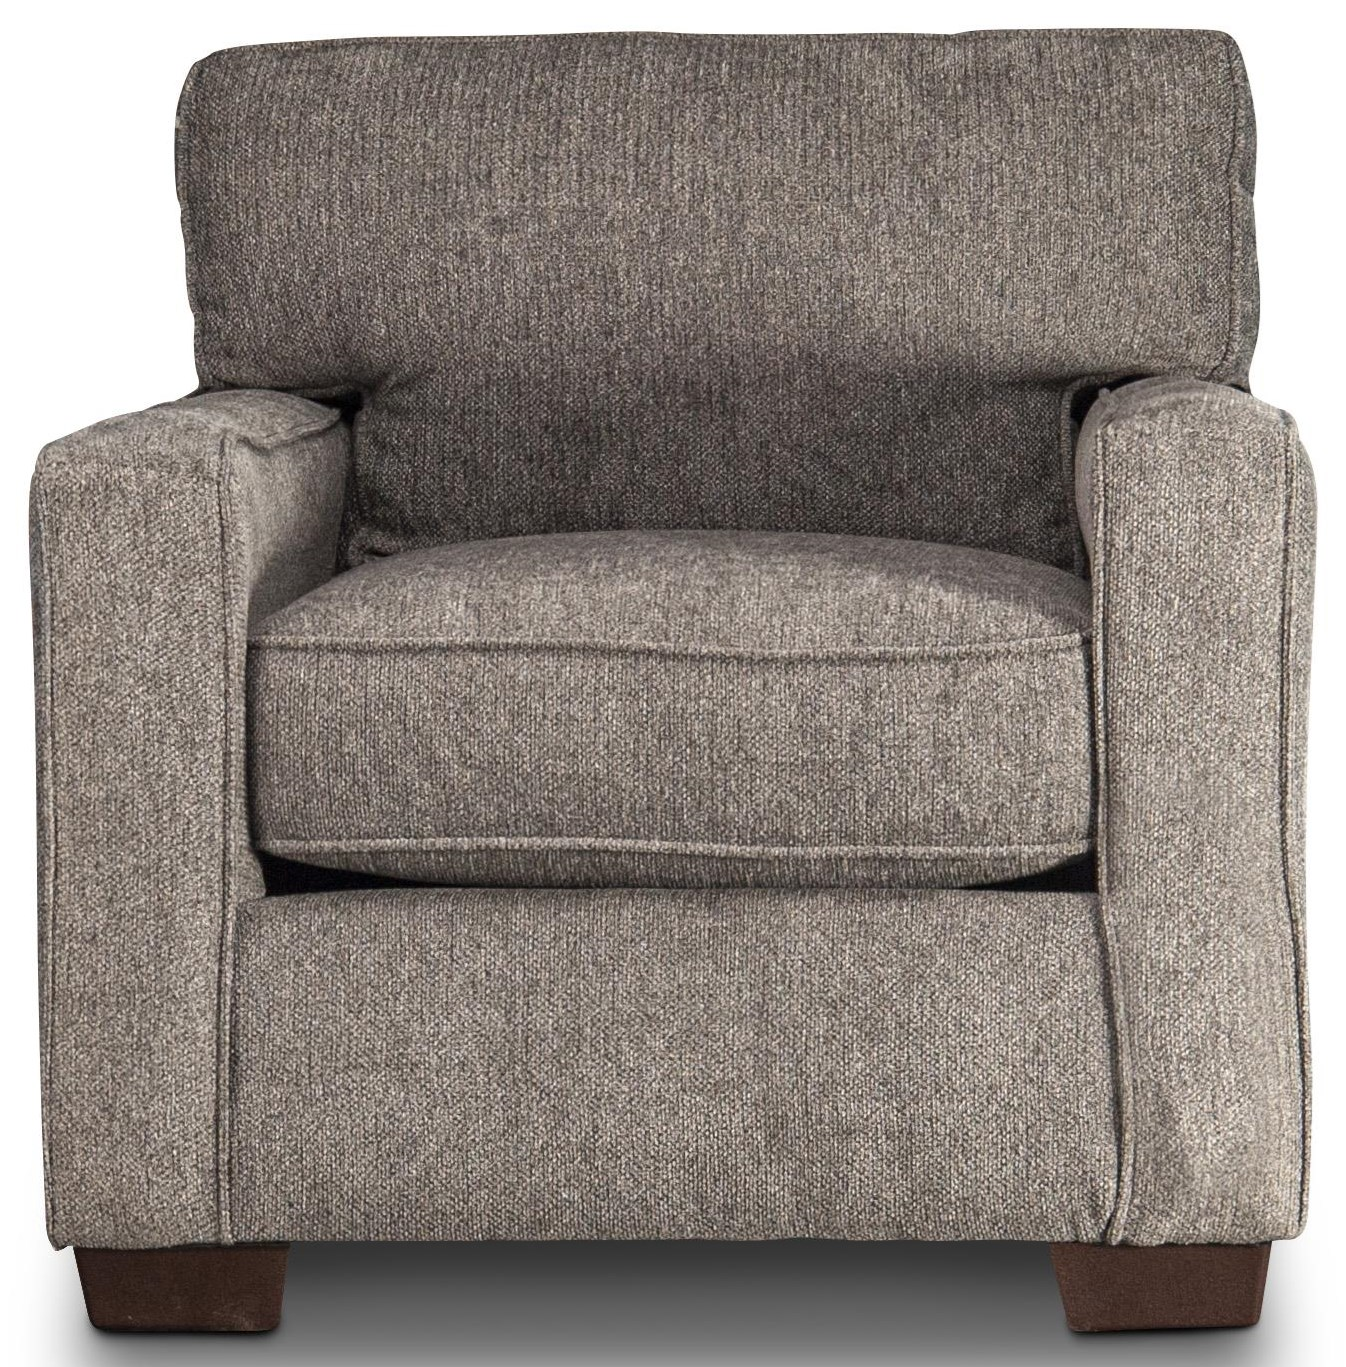 Putnam Putnam Chair by Peak Living at Morris Home